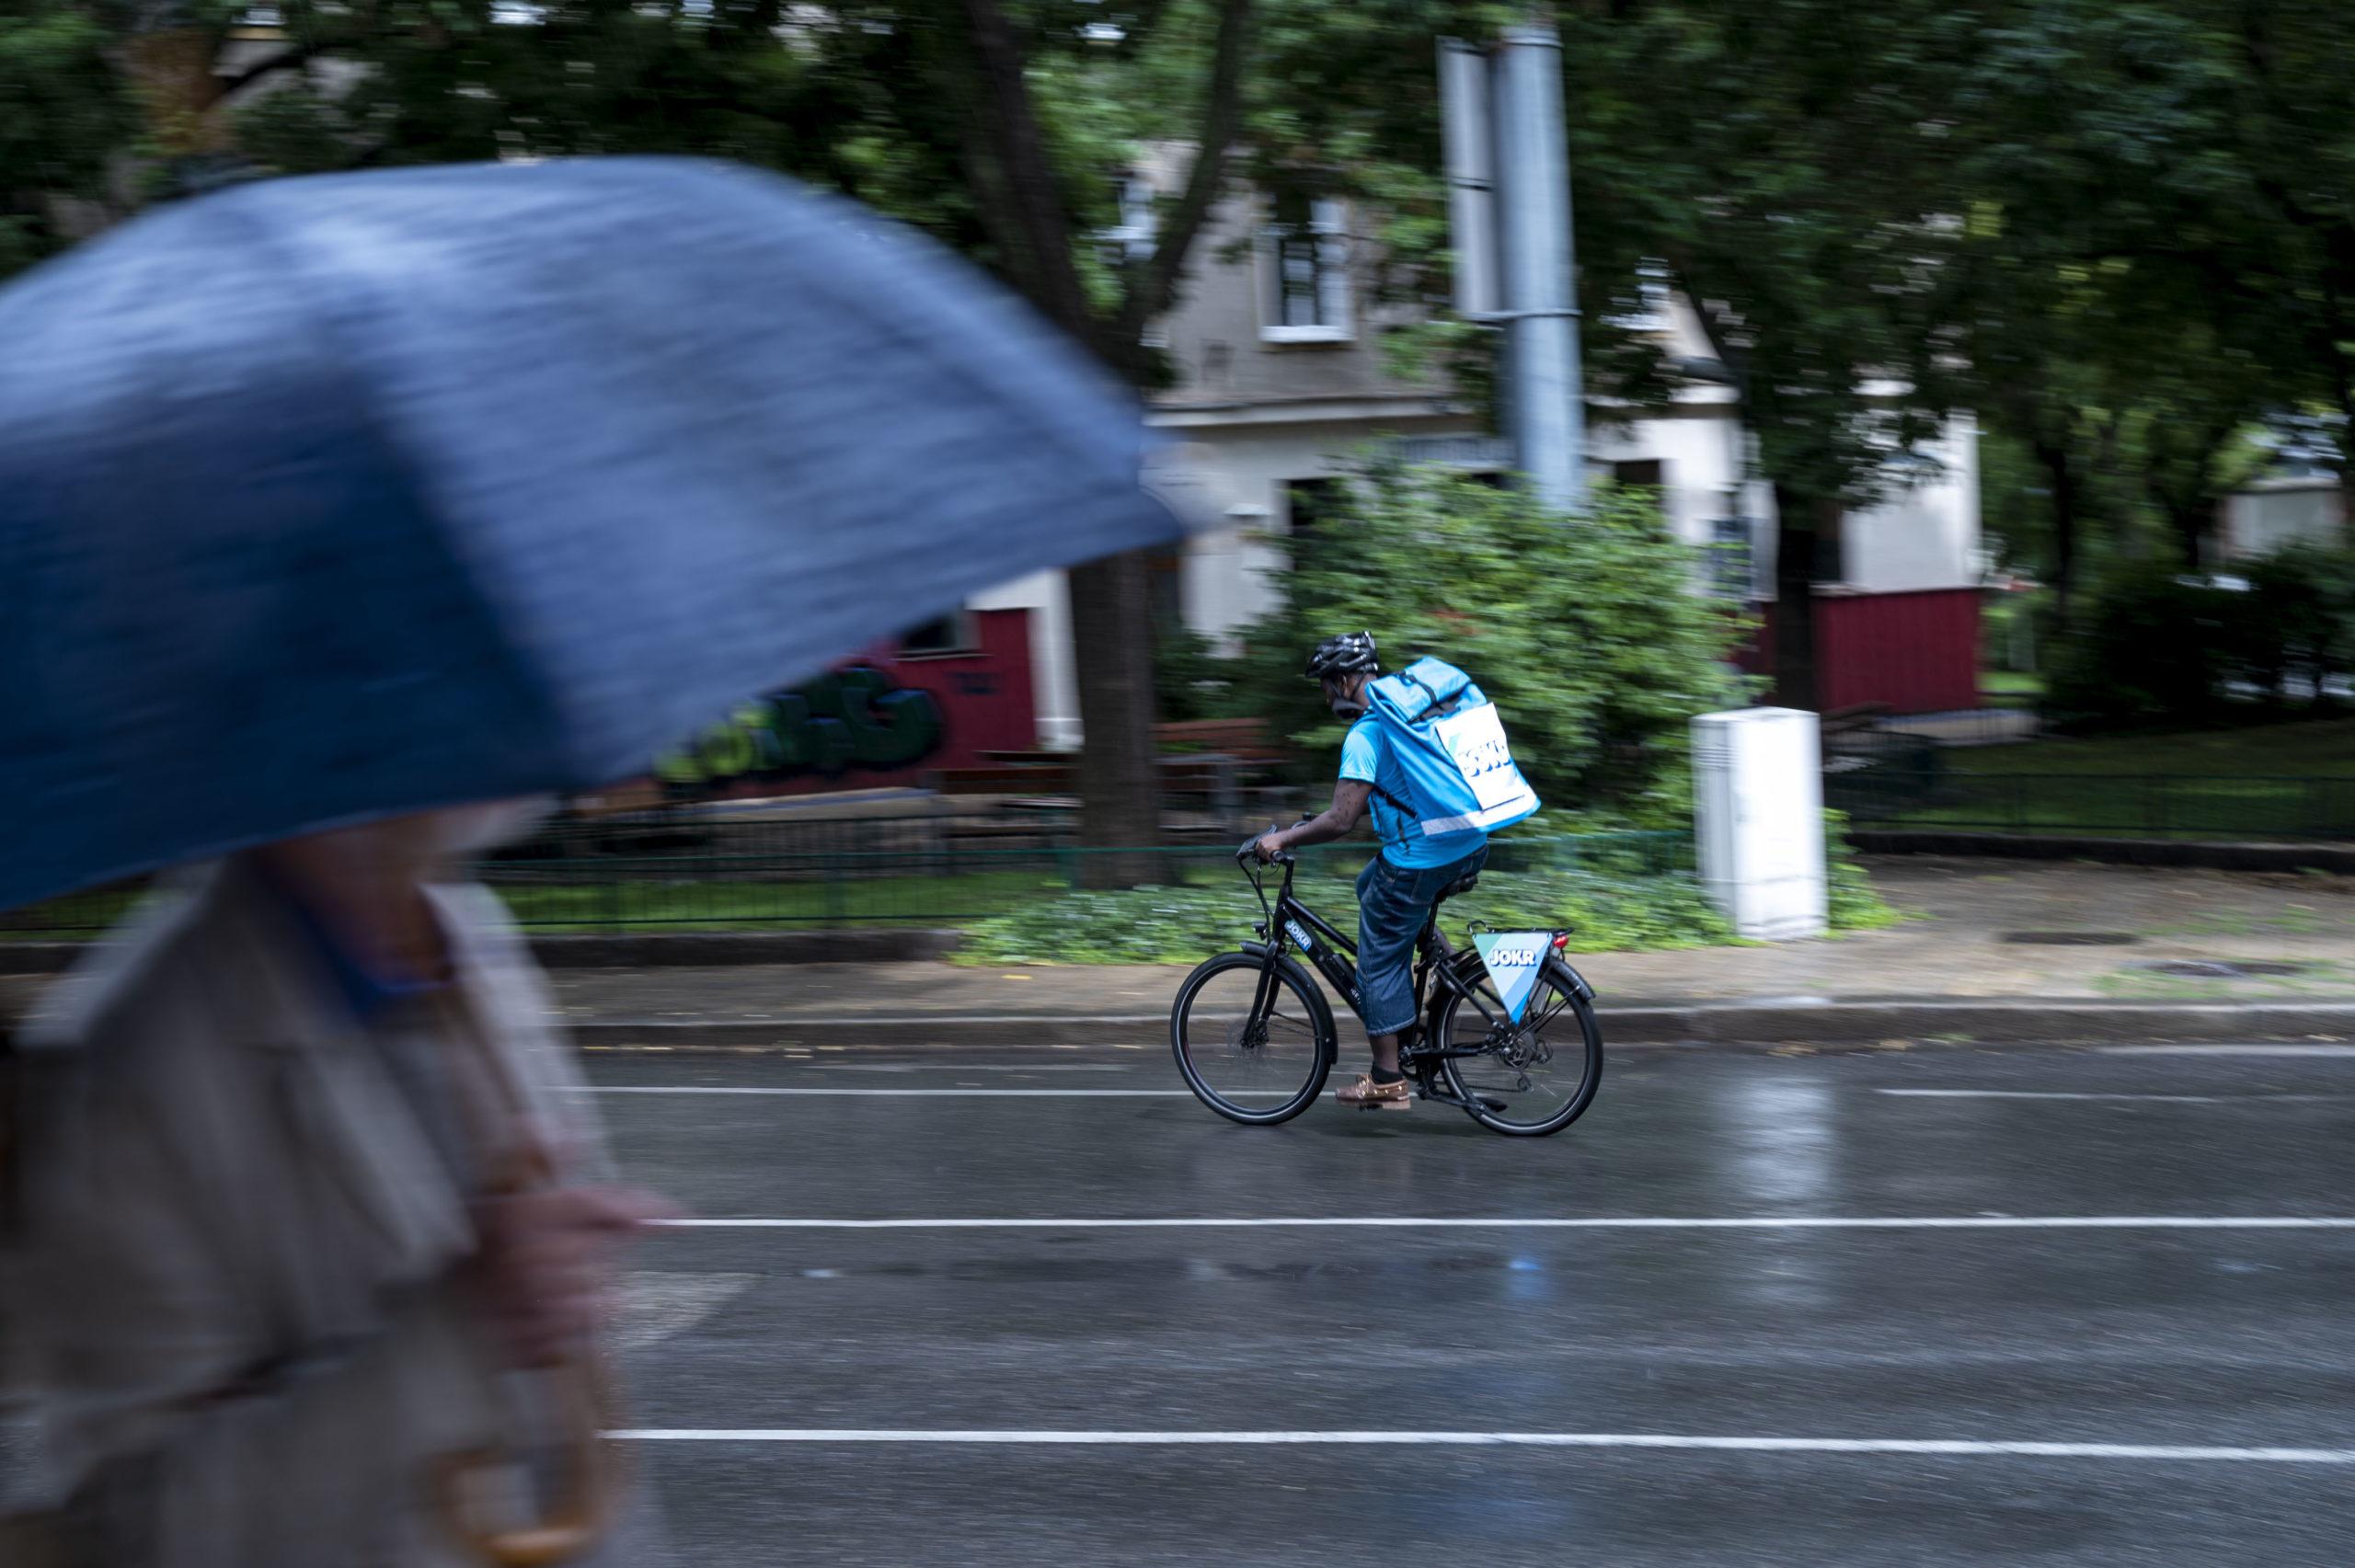 Ein Jokr-Rider in Aktion © Trending Topics / Julia Pabst